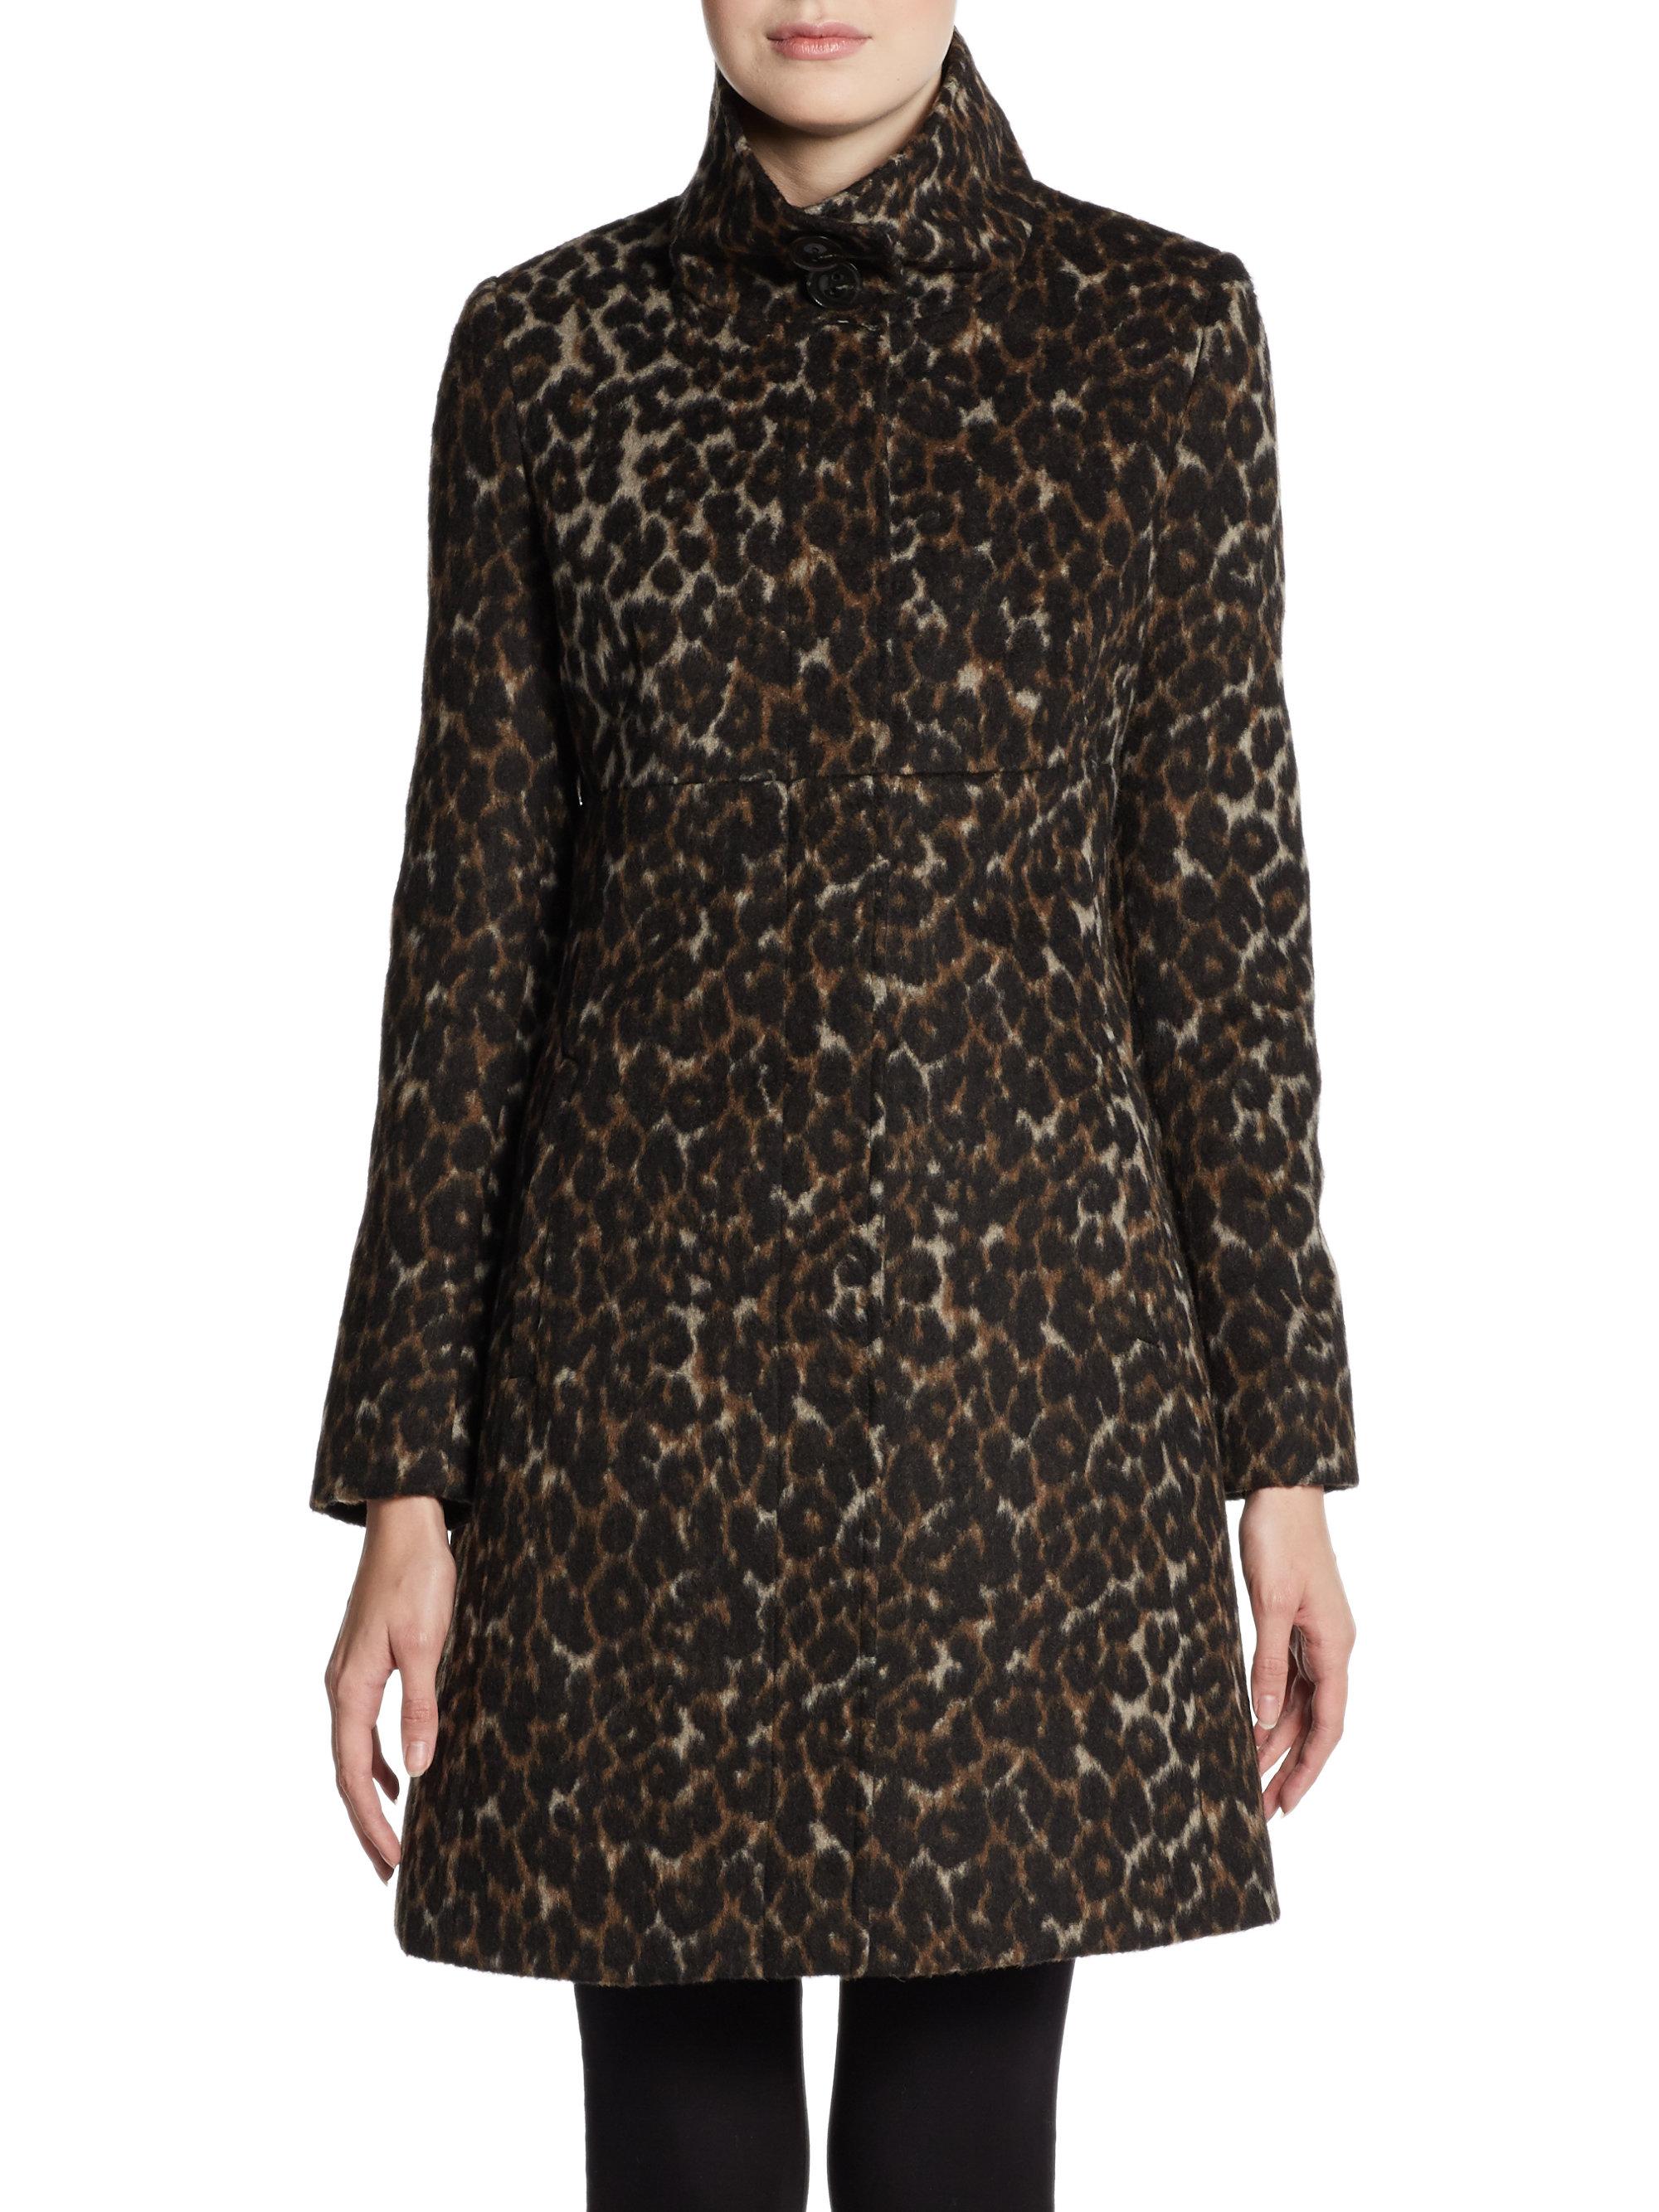 Via Spiga Leopardprint Stand Collar Coat In Animal